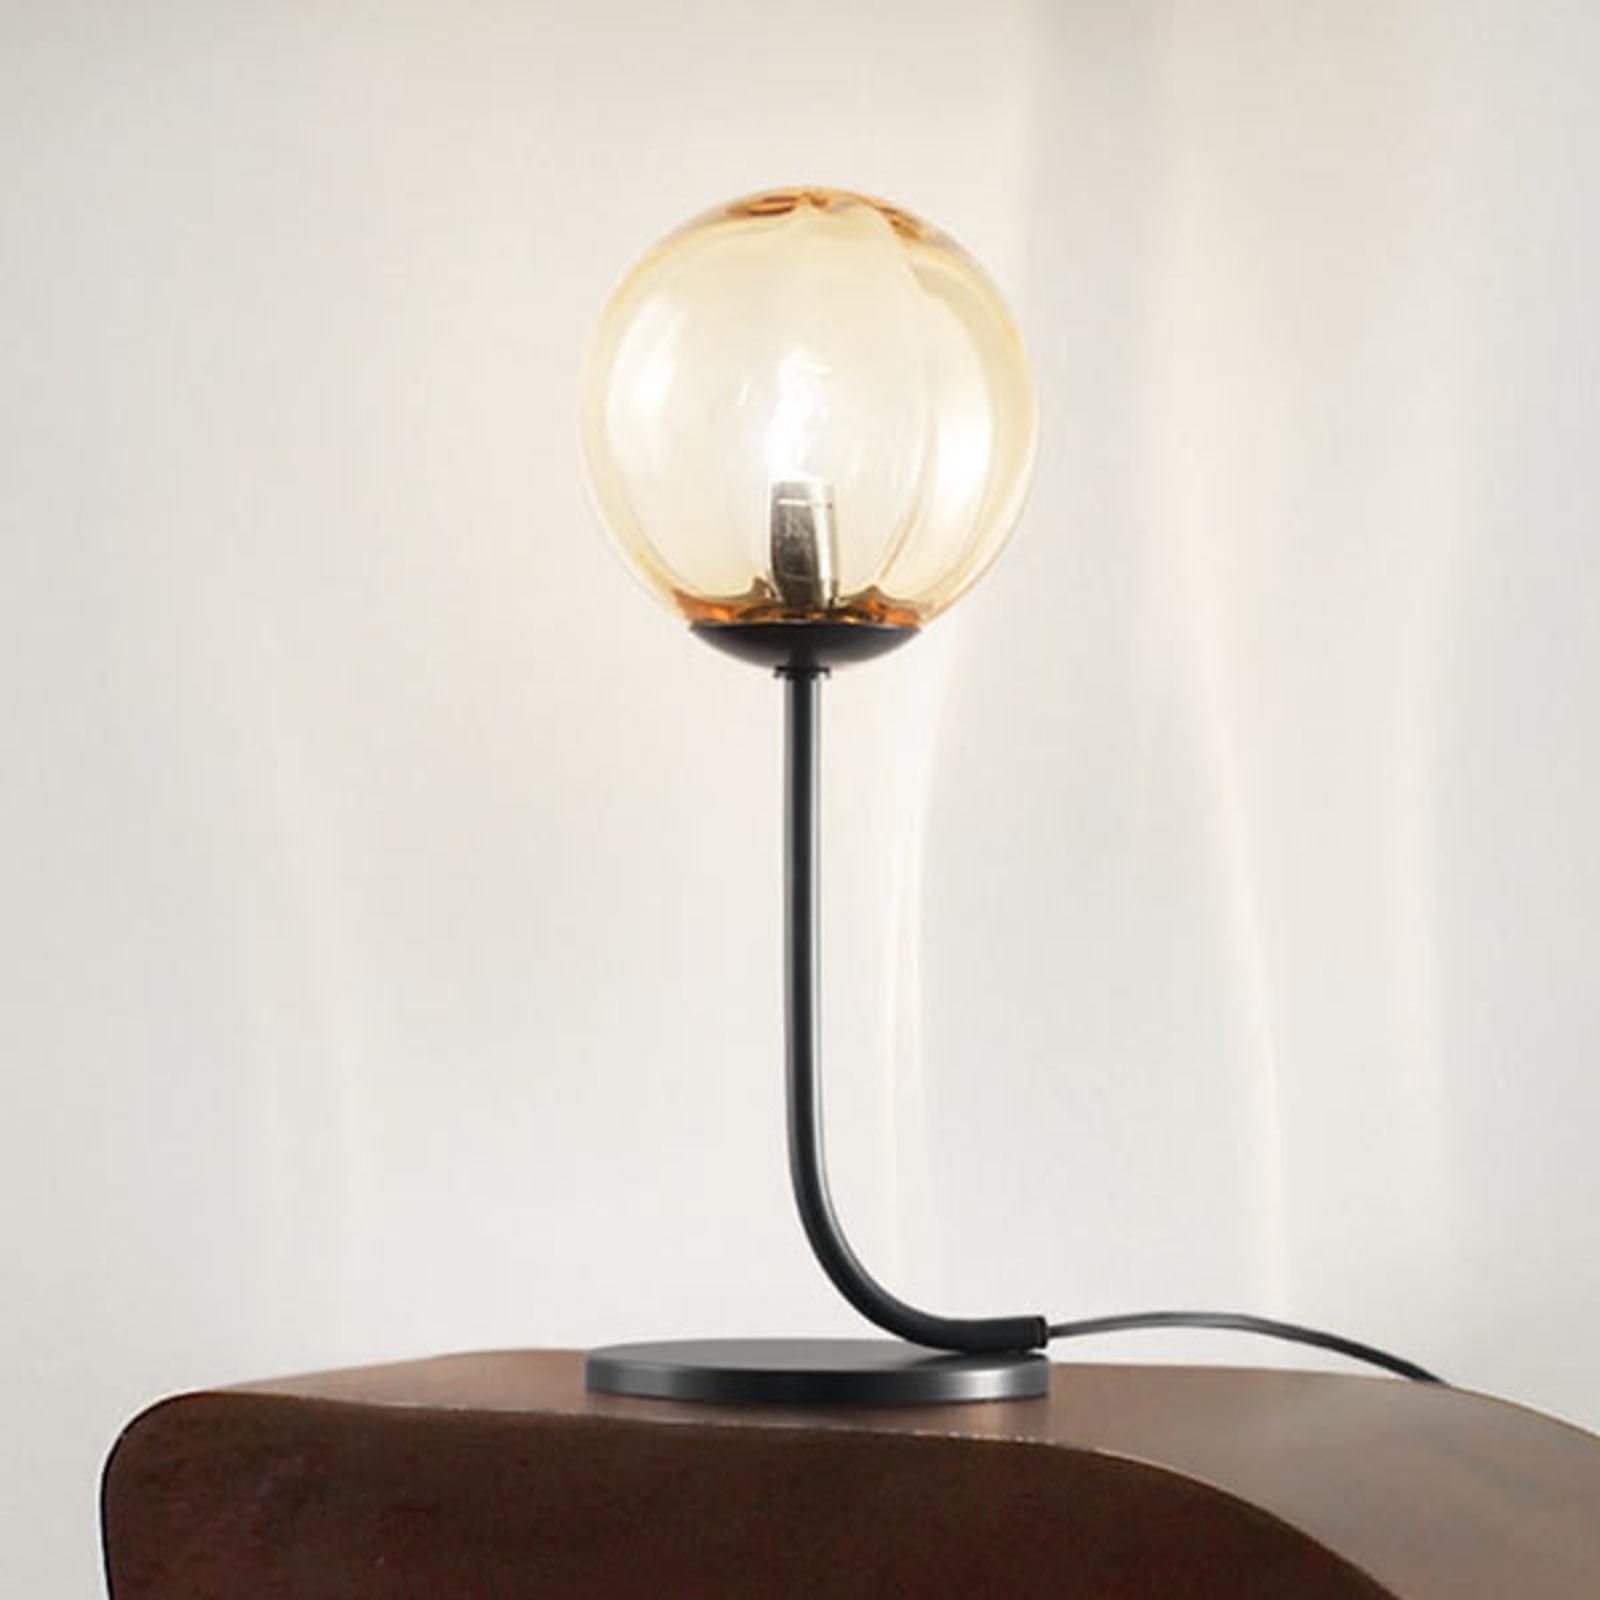 Designerska lampa stołowa Puppet ze szkła murano